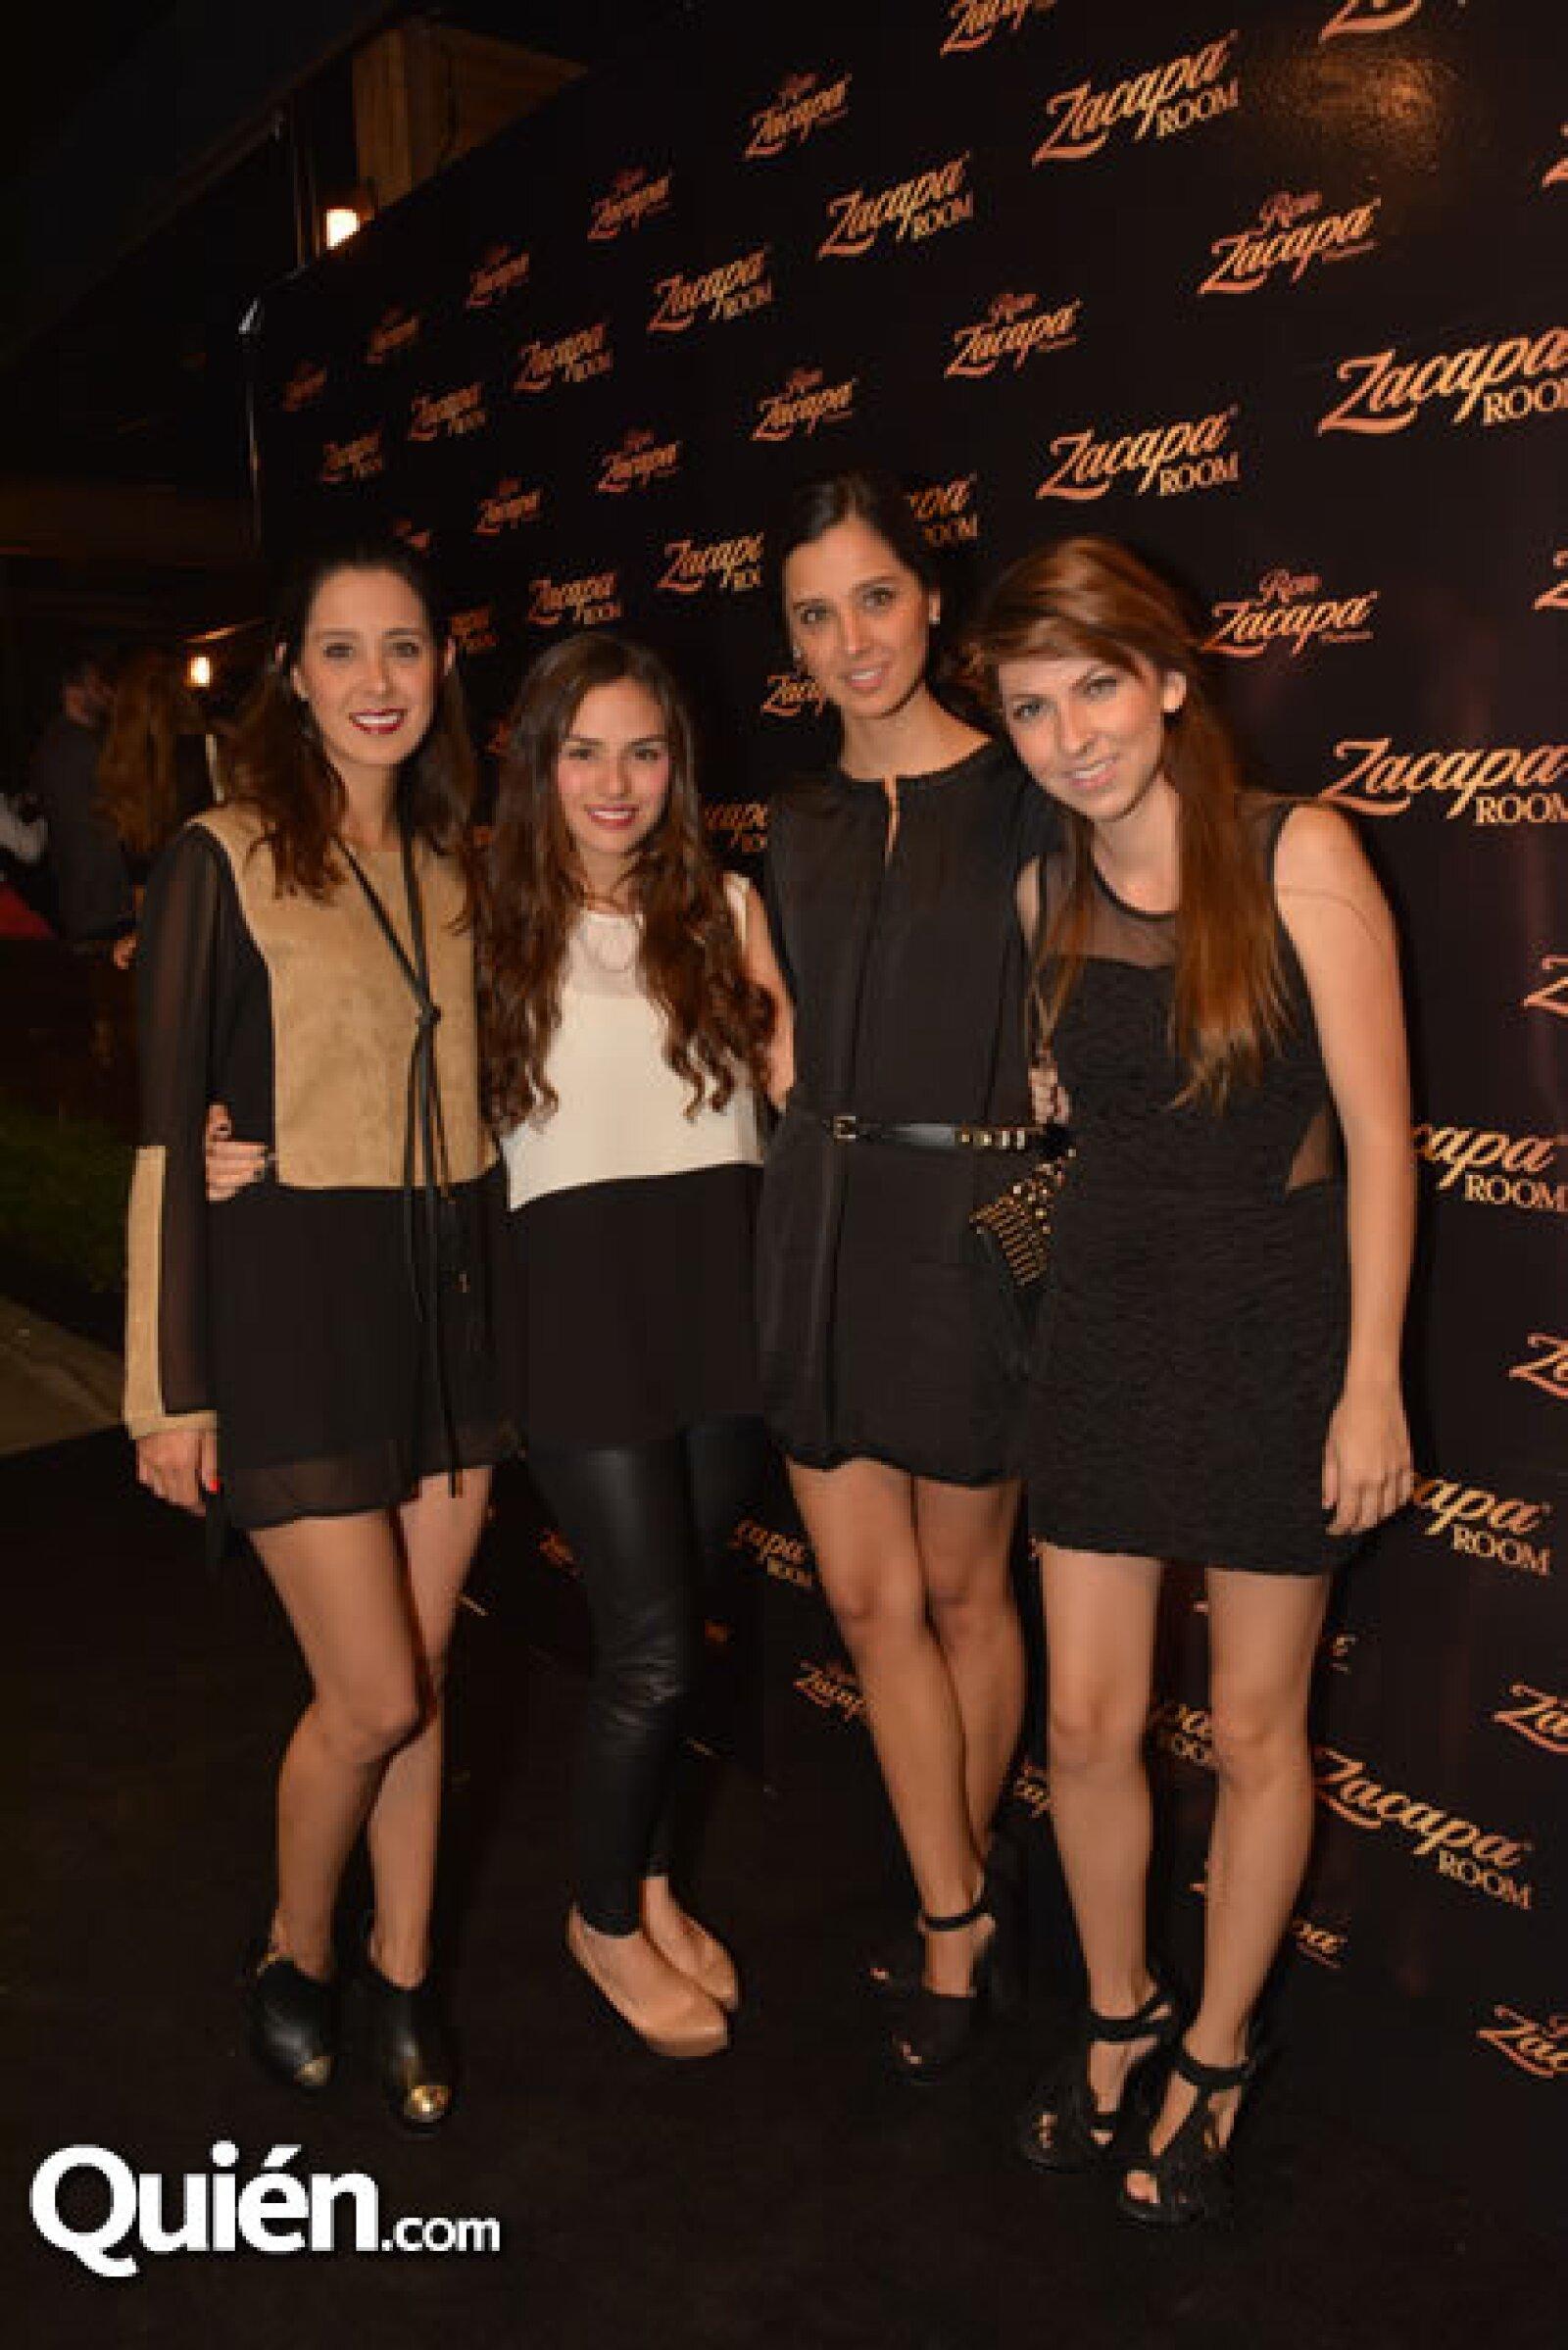 Diana Cerda,Linett Ramírez,Brenda Verdiz,Martha Cerda.